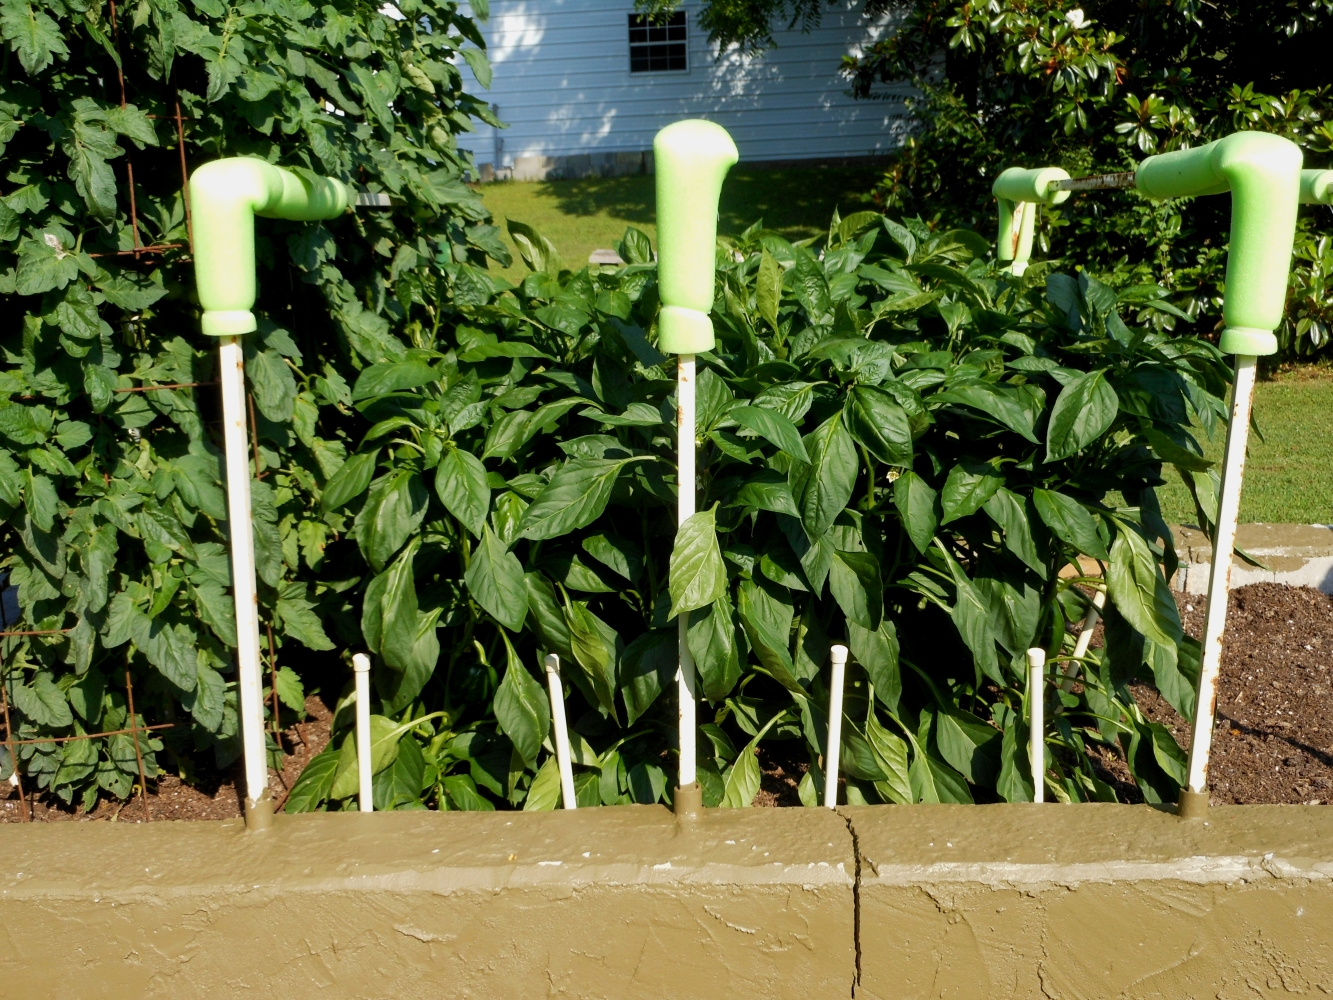 06-15-14_Bell_Pepper_Plants_01